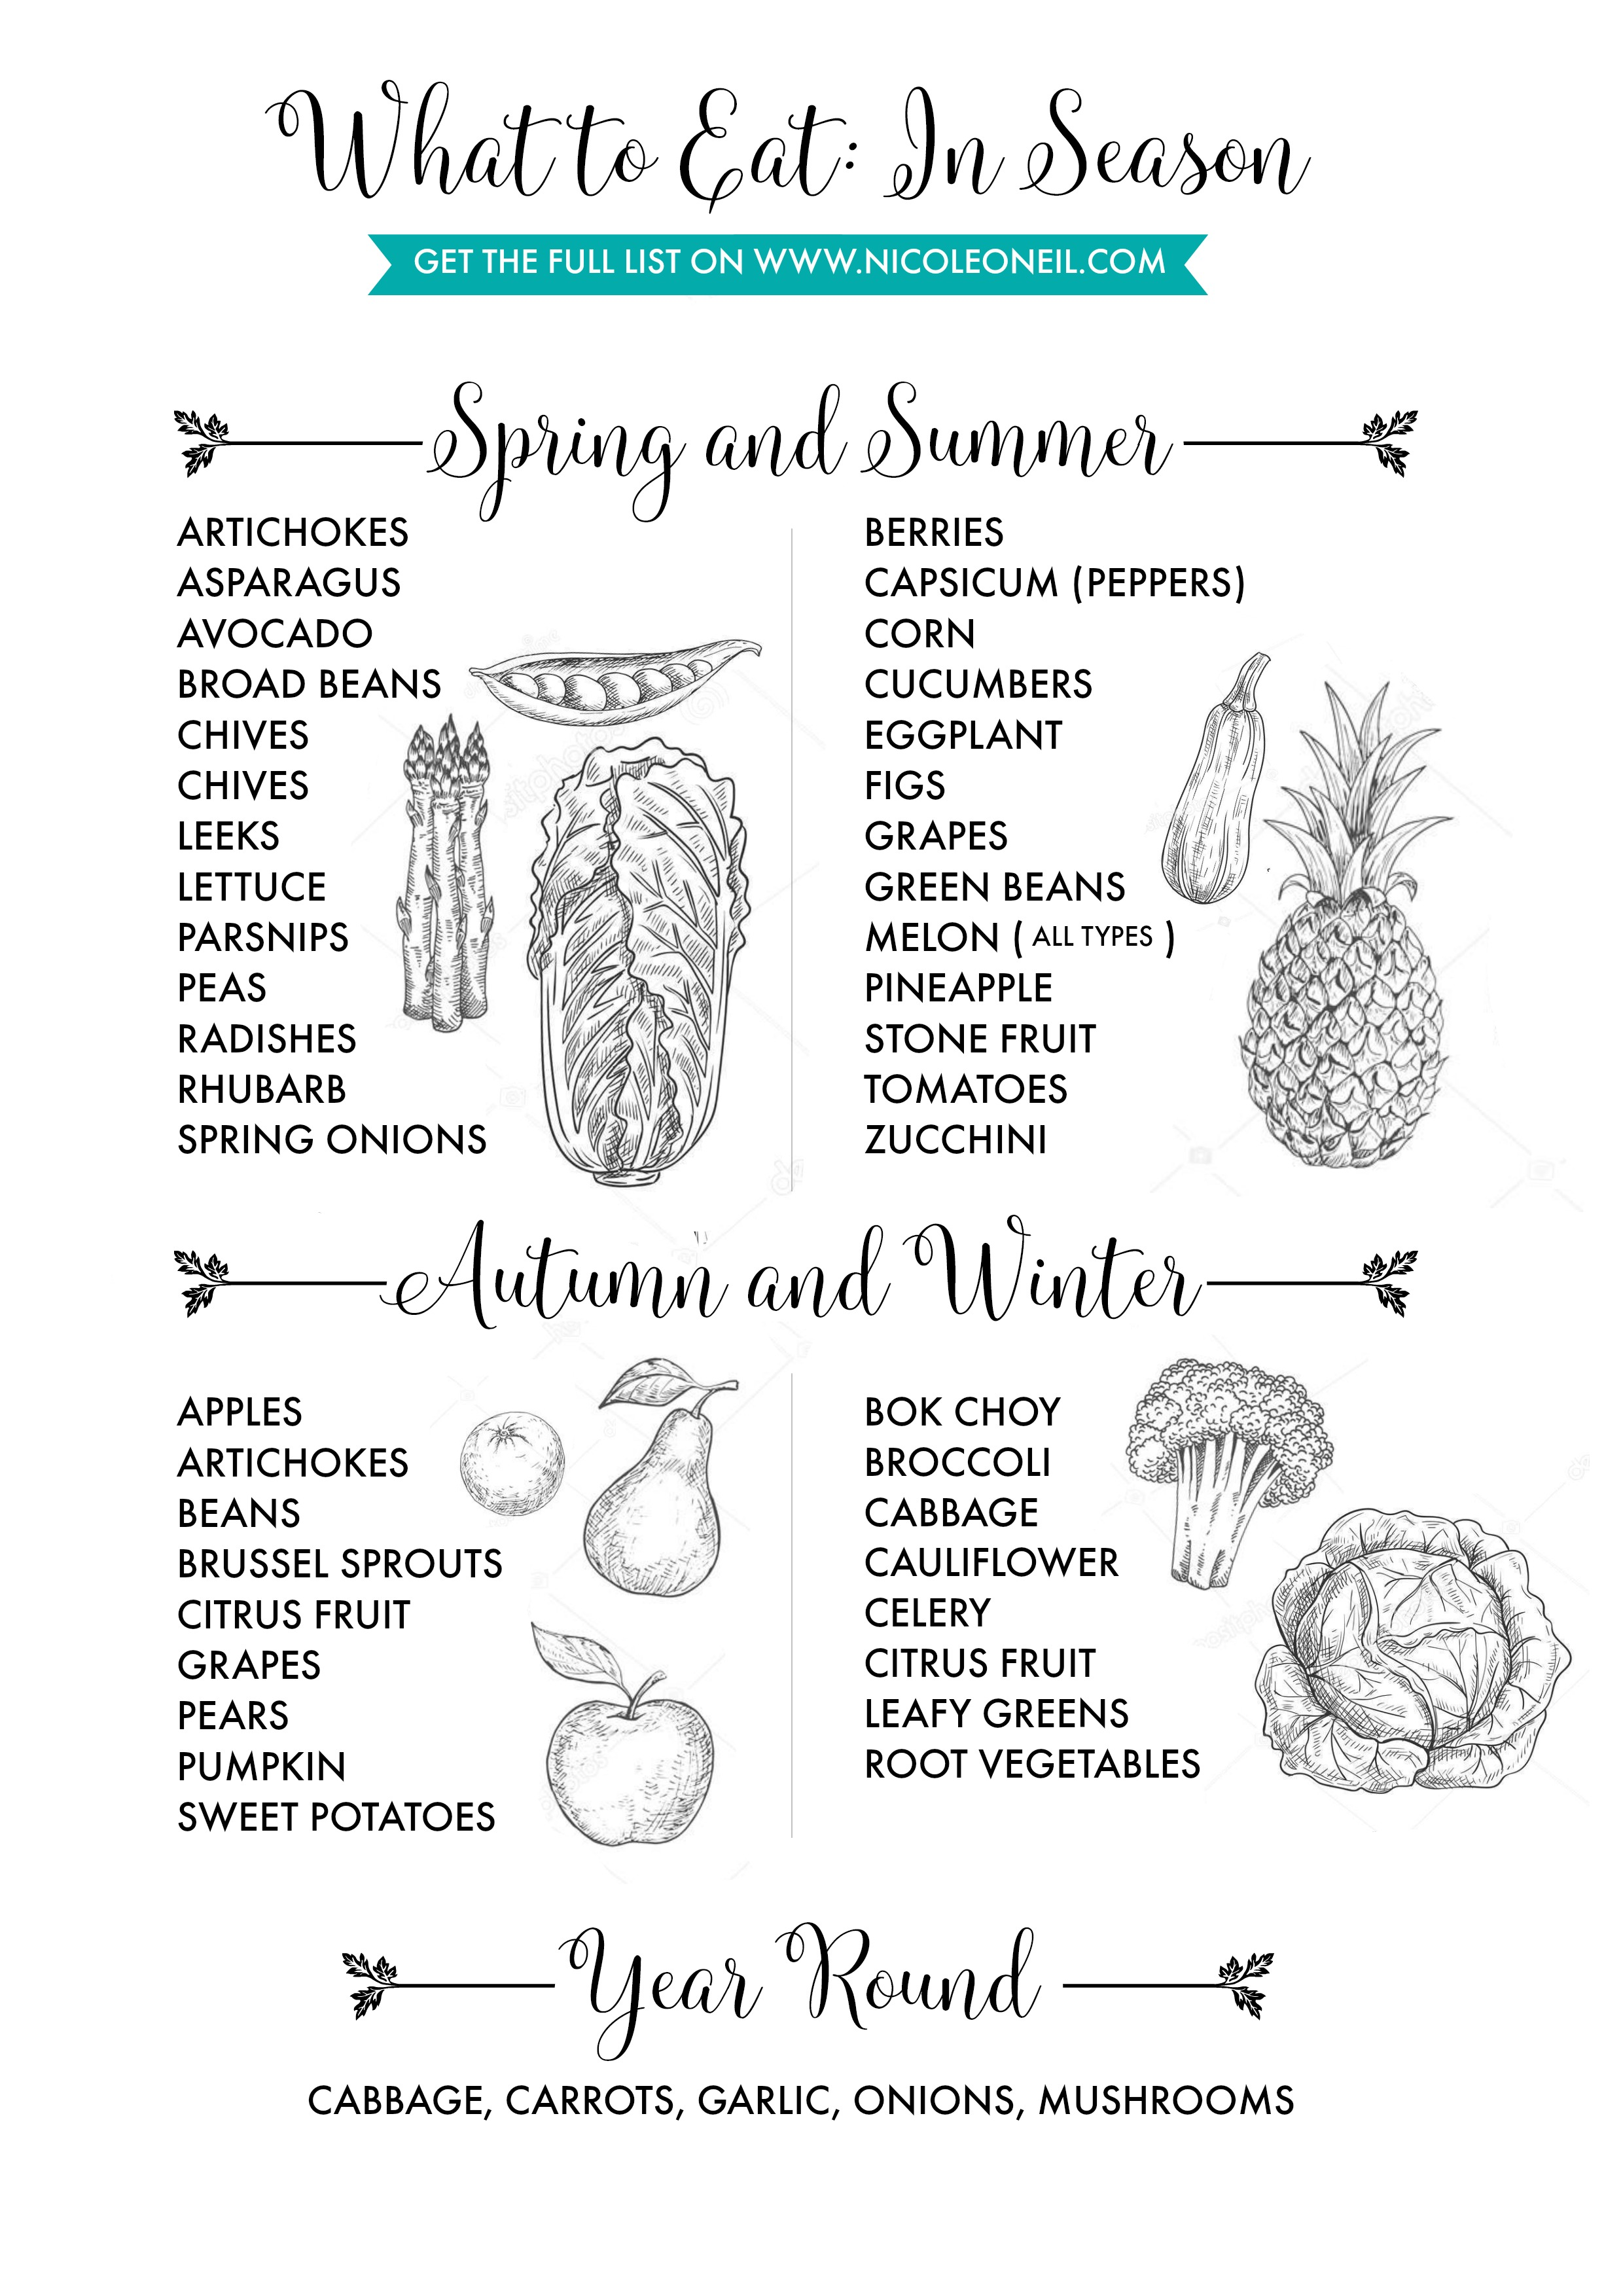 Free Printable Seasonal Produce Chart From Nicole O'Neil.